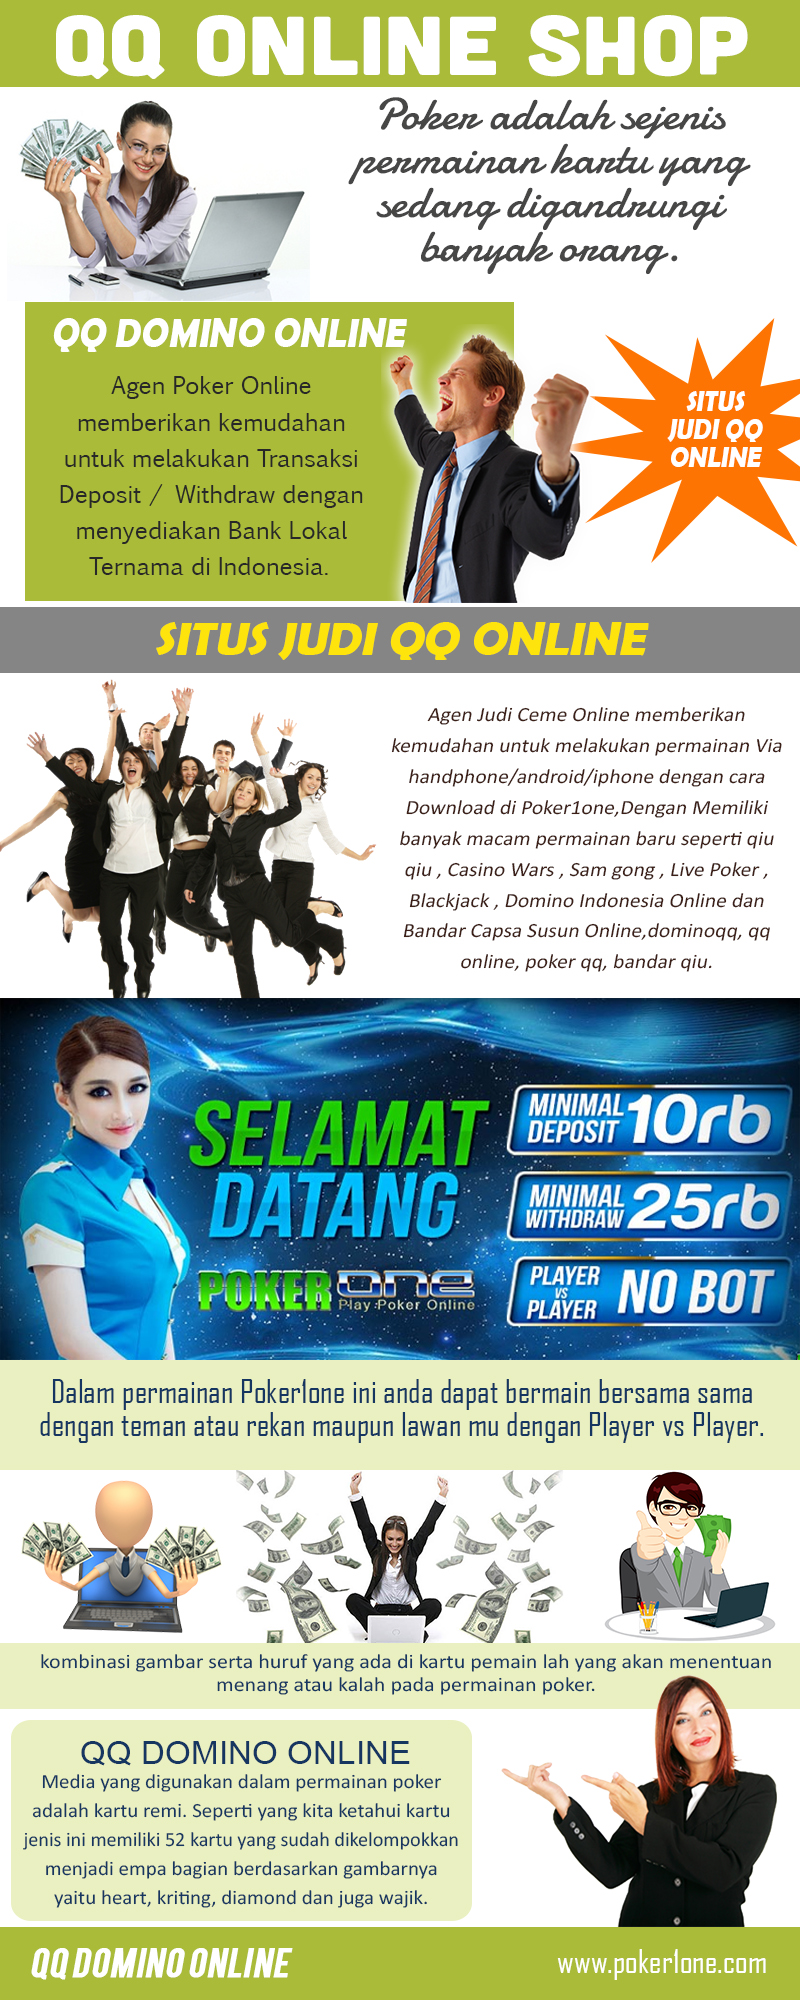 Situs Judi Online Qq